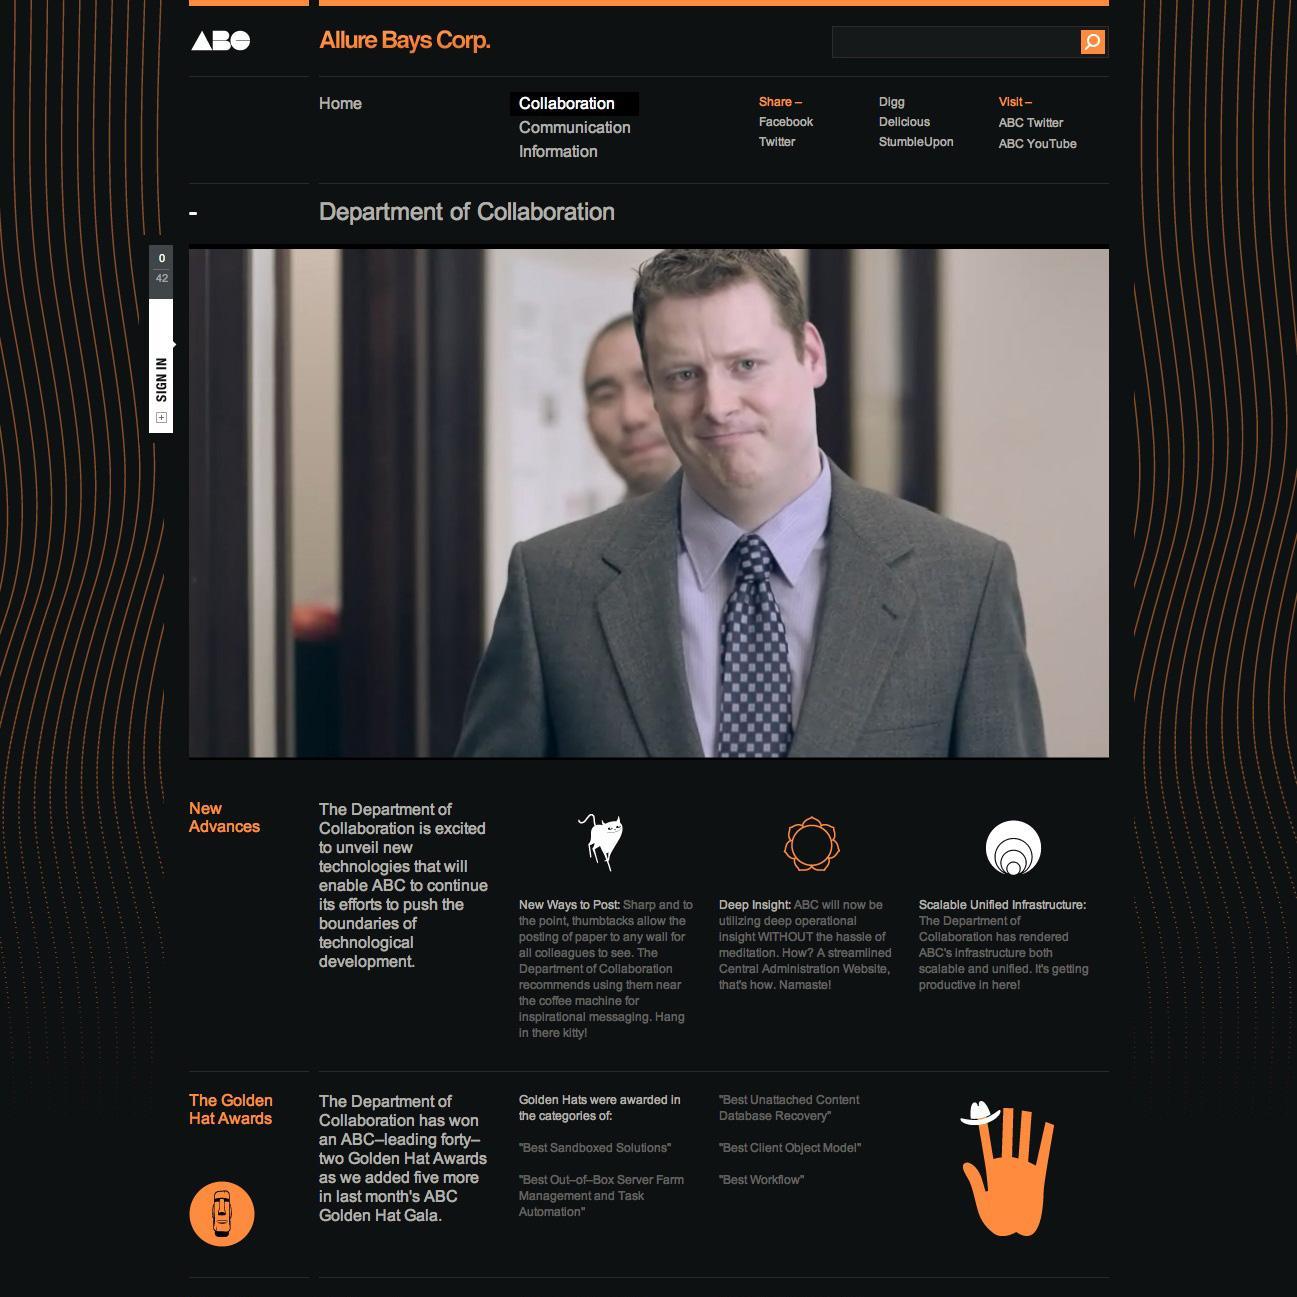 Microsoft Digital Ad -  Allure Bays Corp.